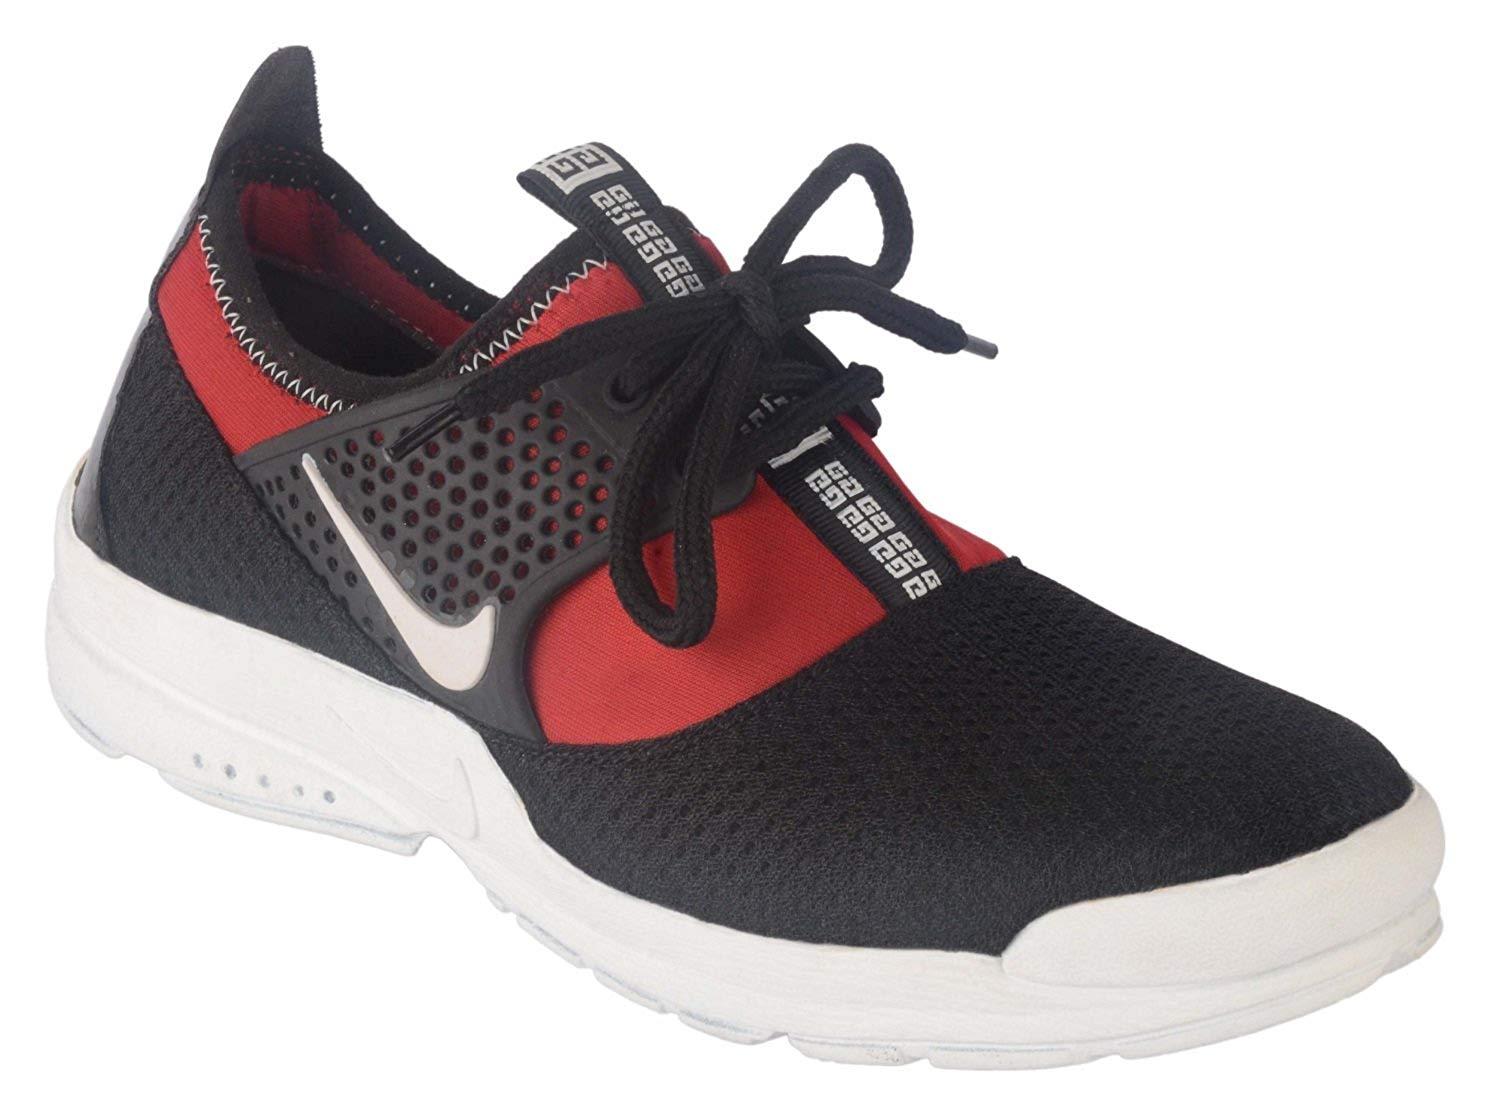 939e24997 BUY aadi Men's Mesh Stylish Sports Shoes @ 399 | Sports Goods Online ...